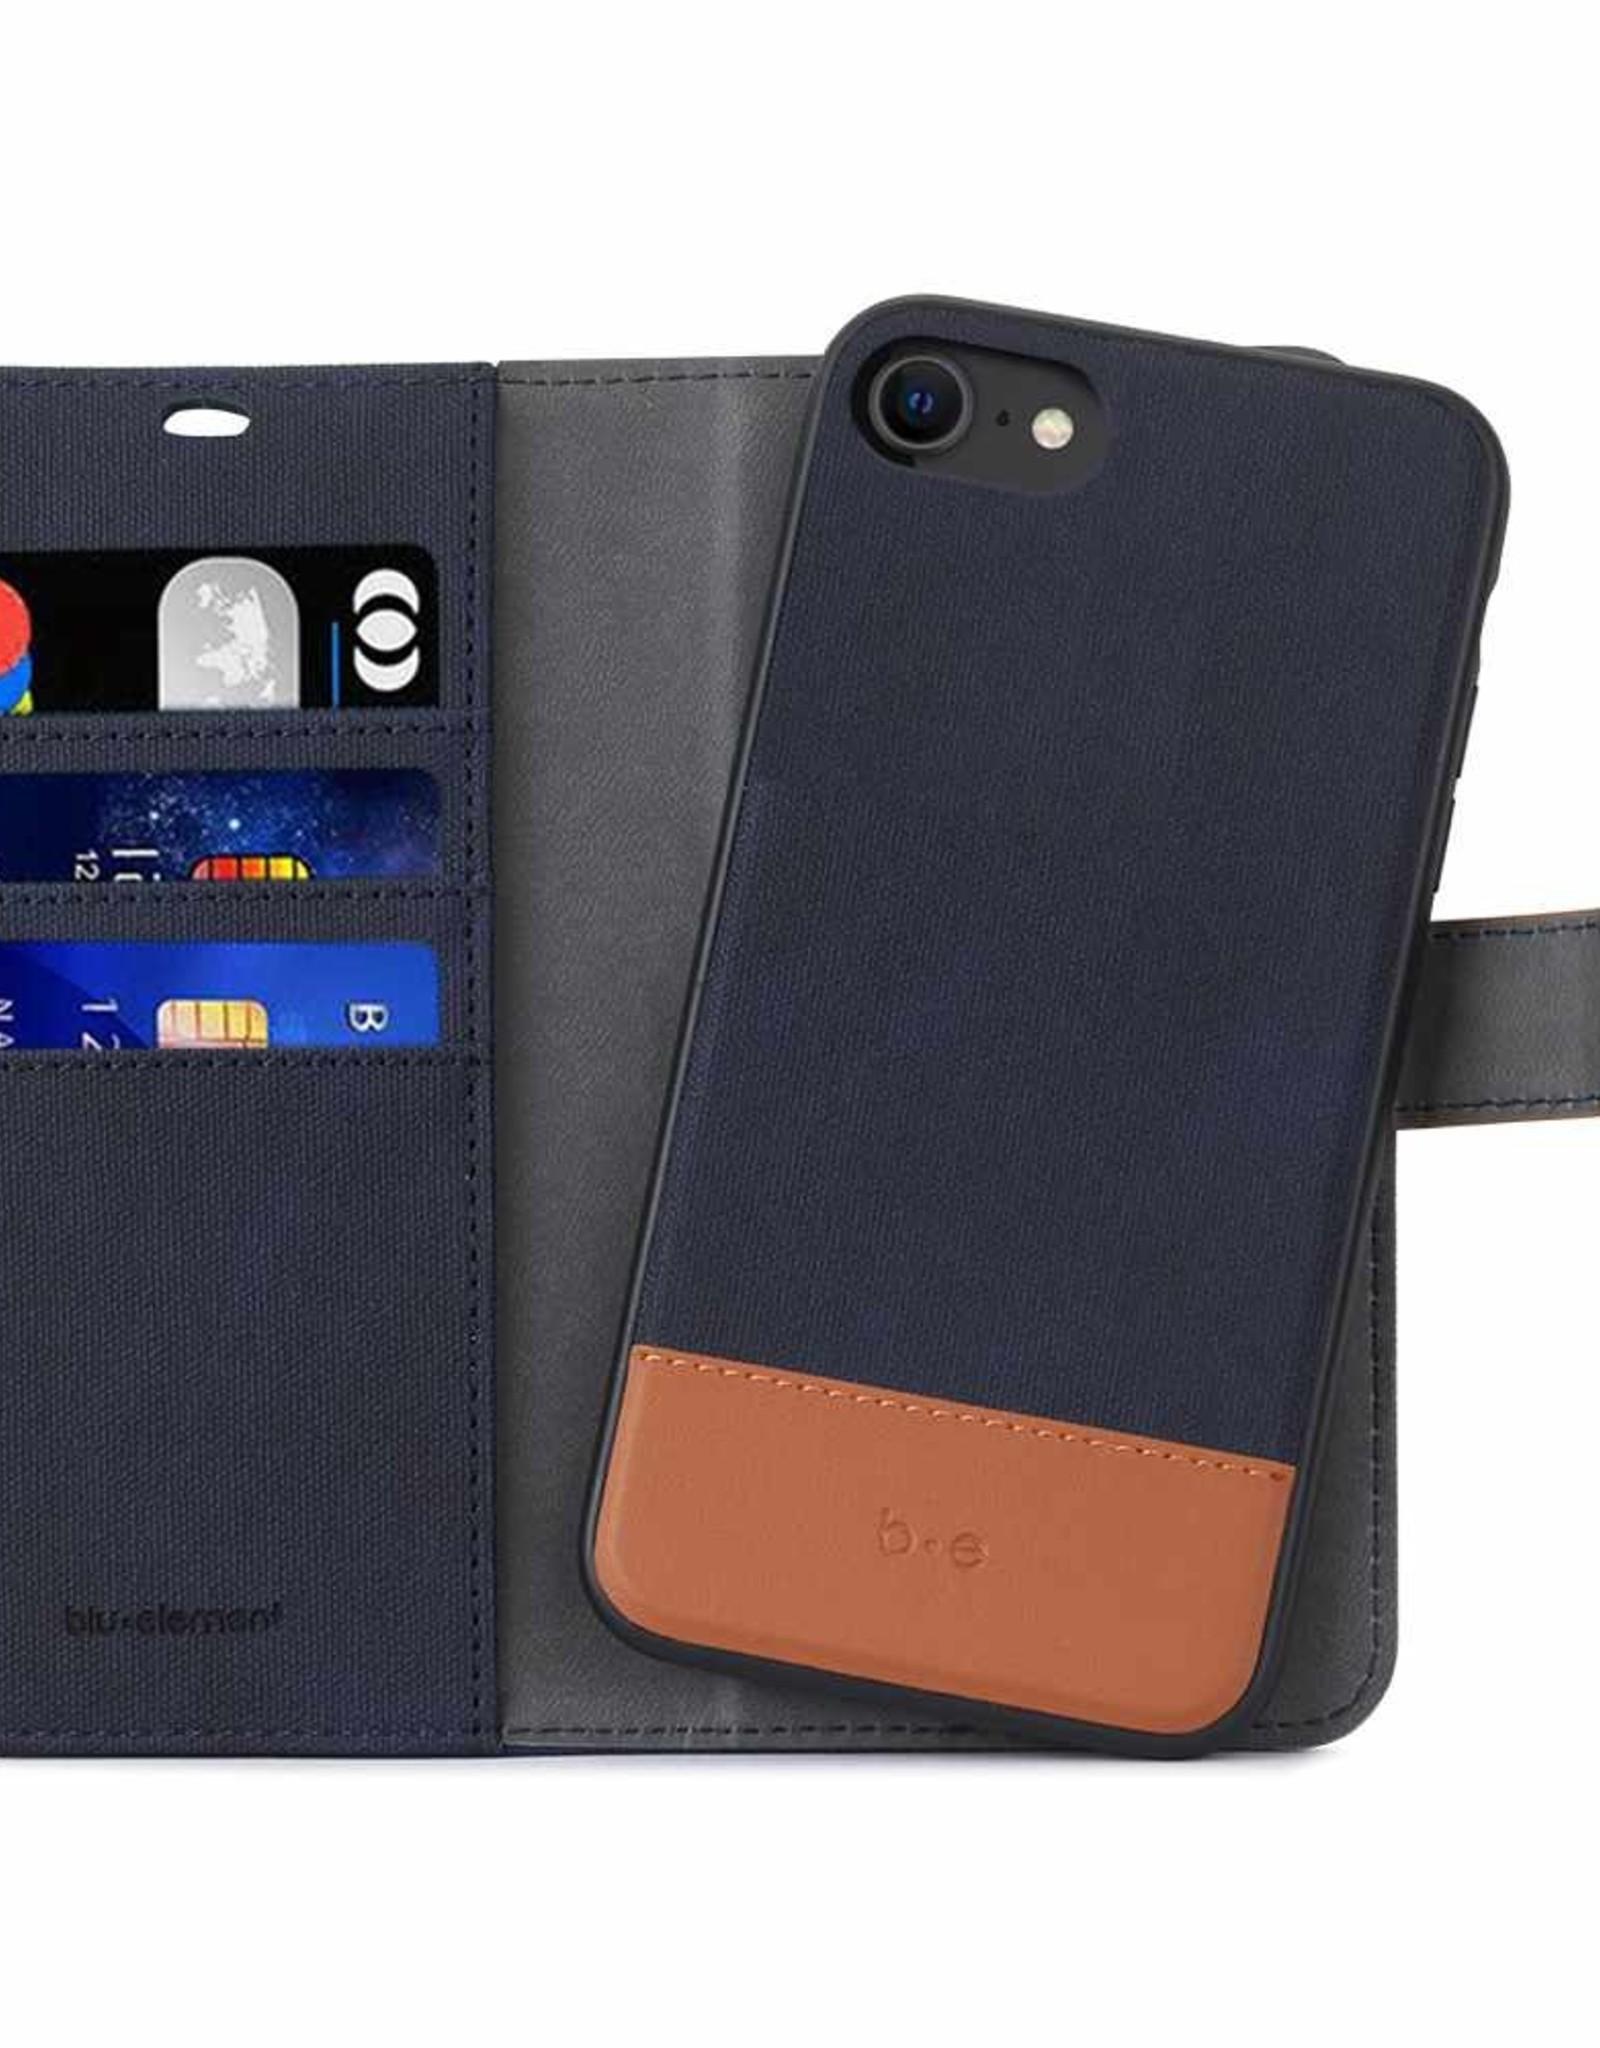 Blu Element Blu Element - 2 in 1 Folio Case Navy/Tan for iPhone SE 2020/8/7 120-2909